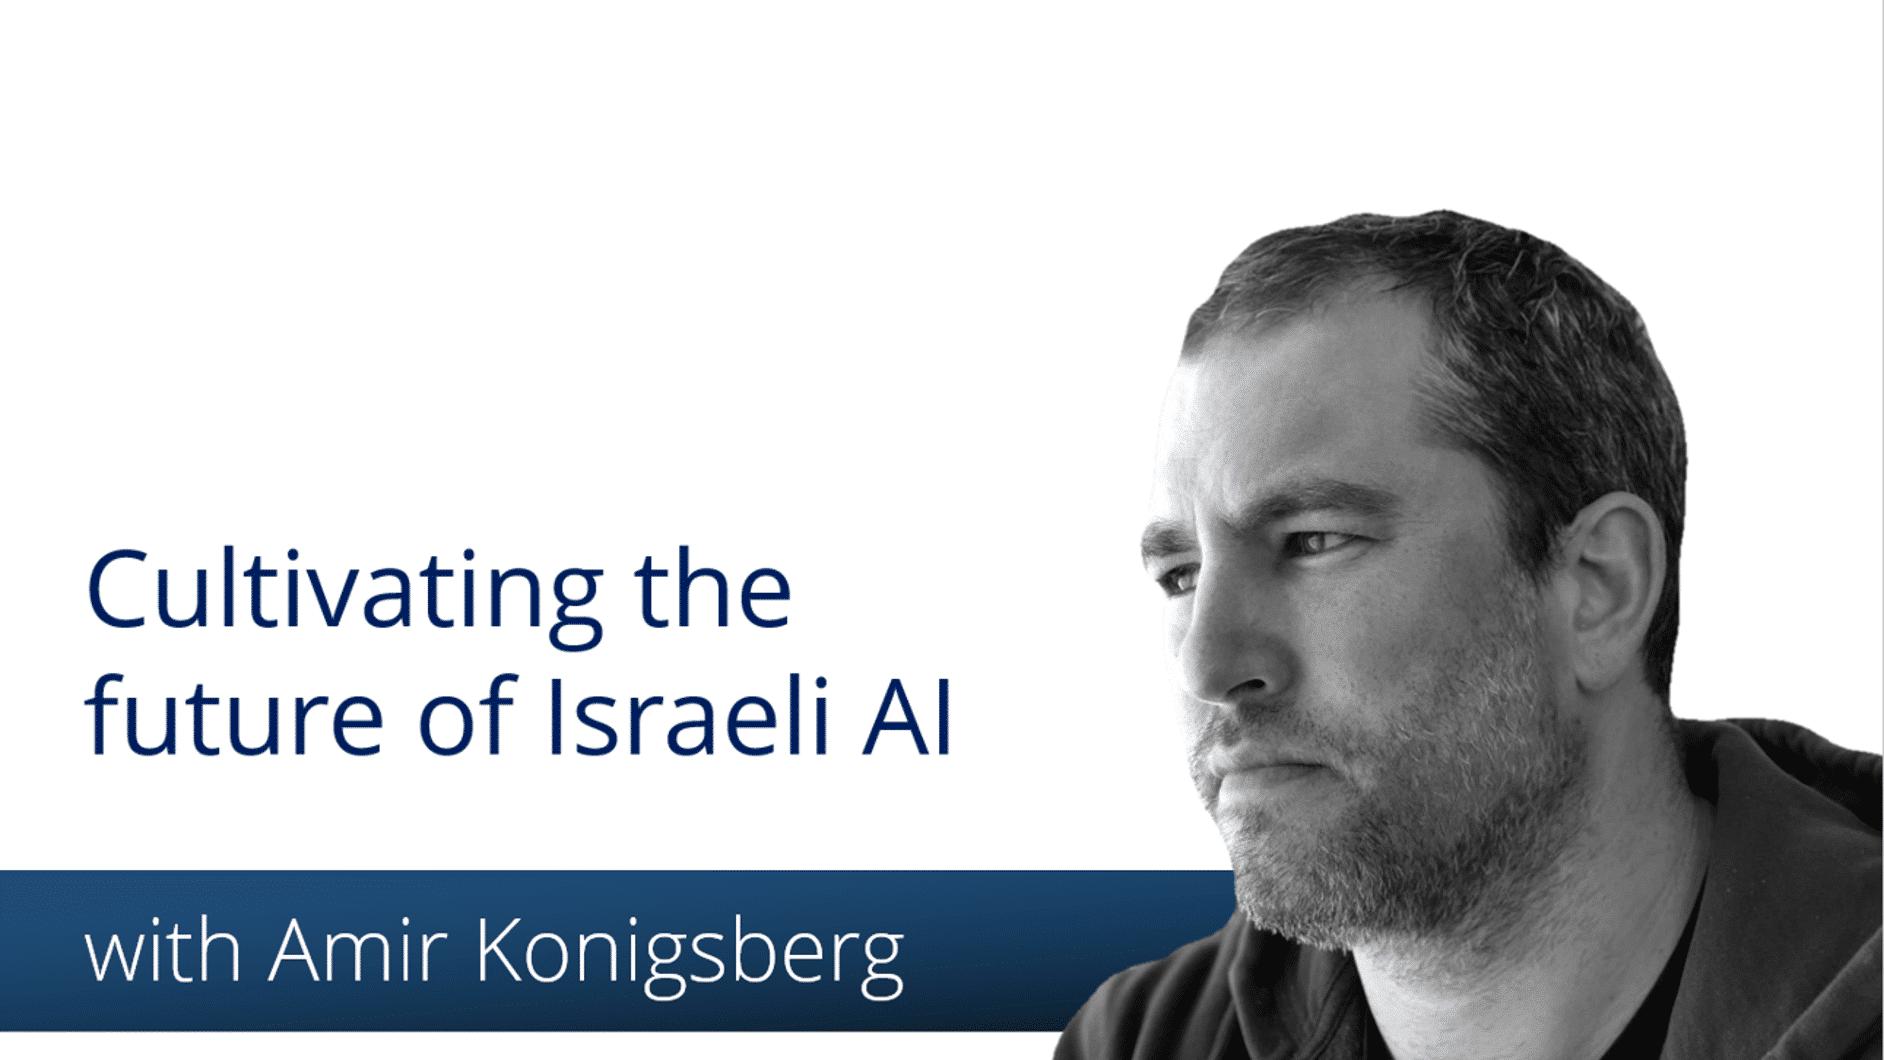 Melting Psychology and Deep Technology with Amir Konigsberg